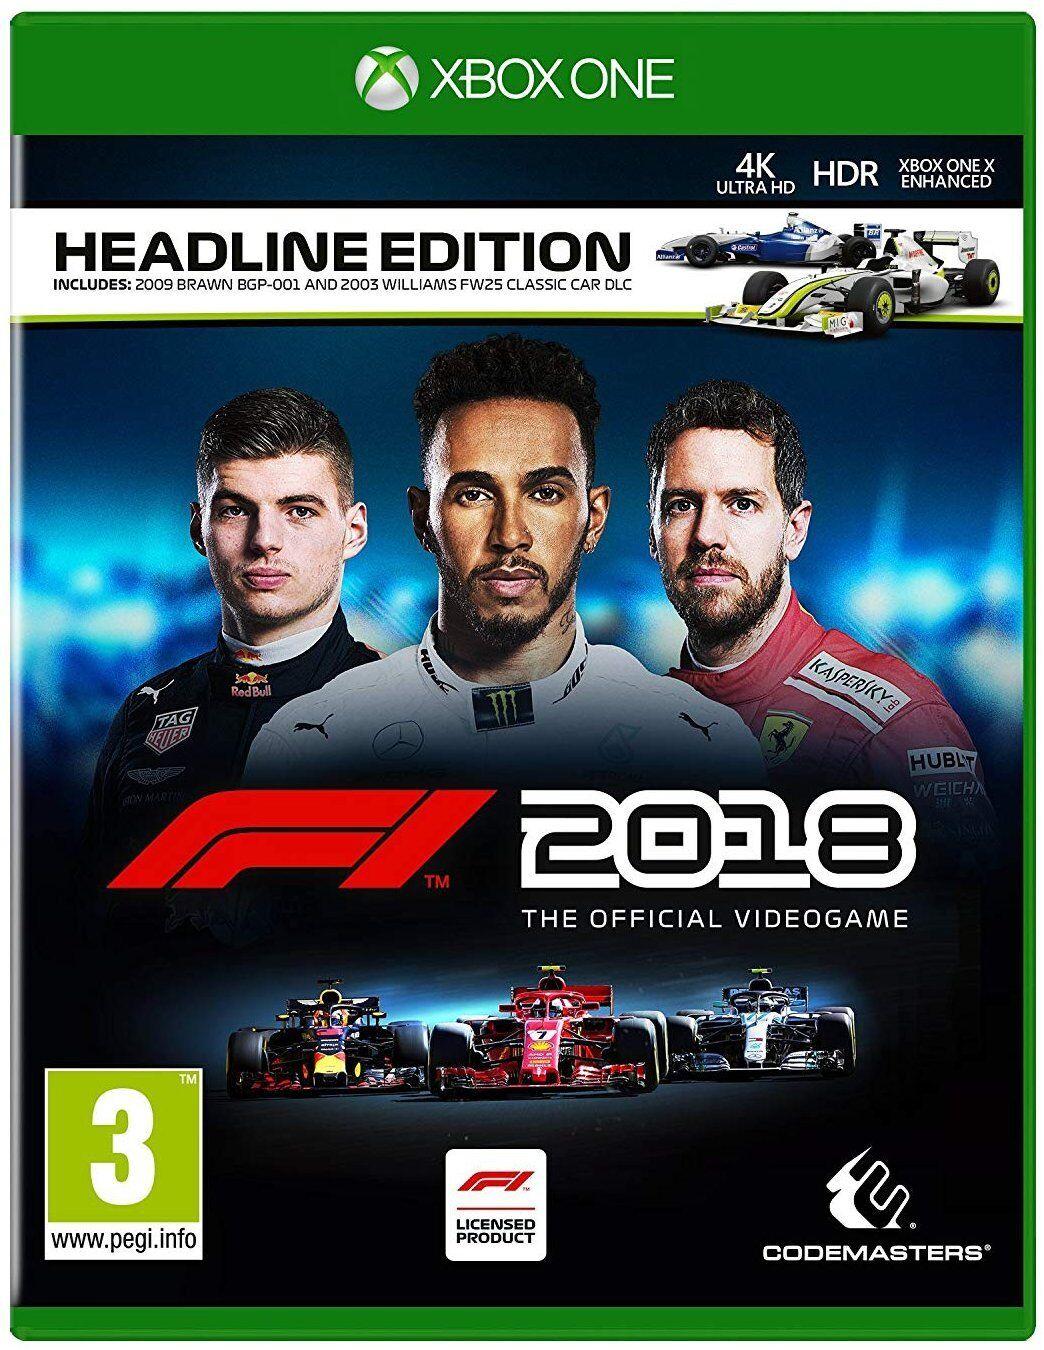 F1 Forumla 1 2018 Headline Edition | XBox One Racing | NEU & OVP | Blitzversand